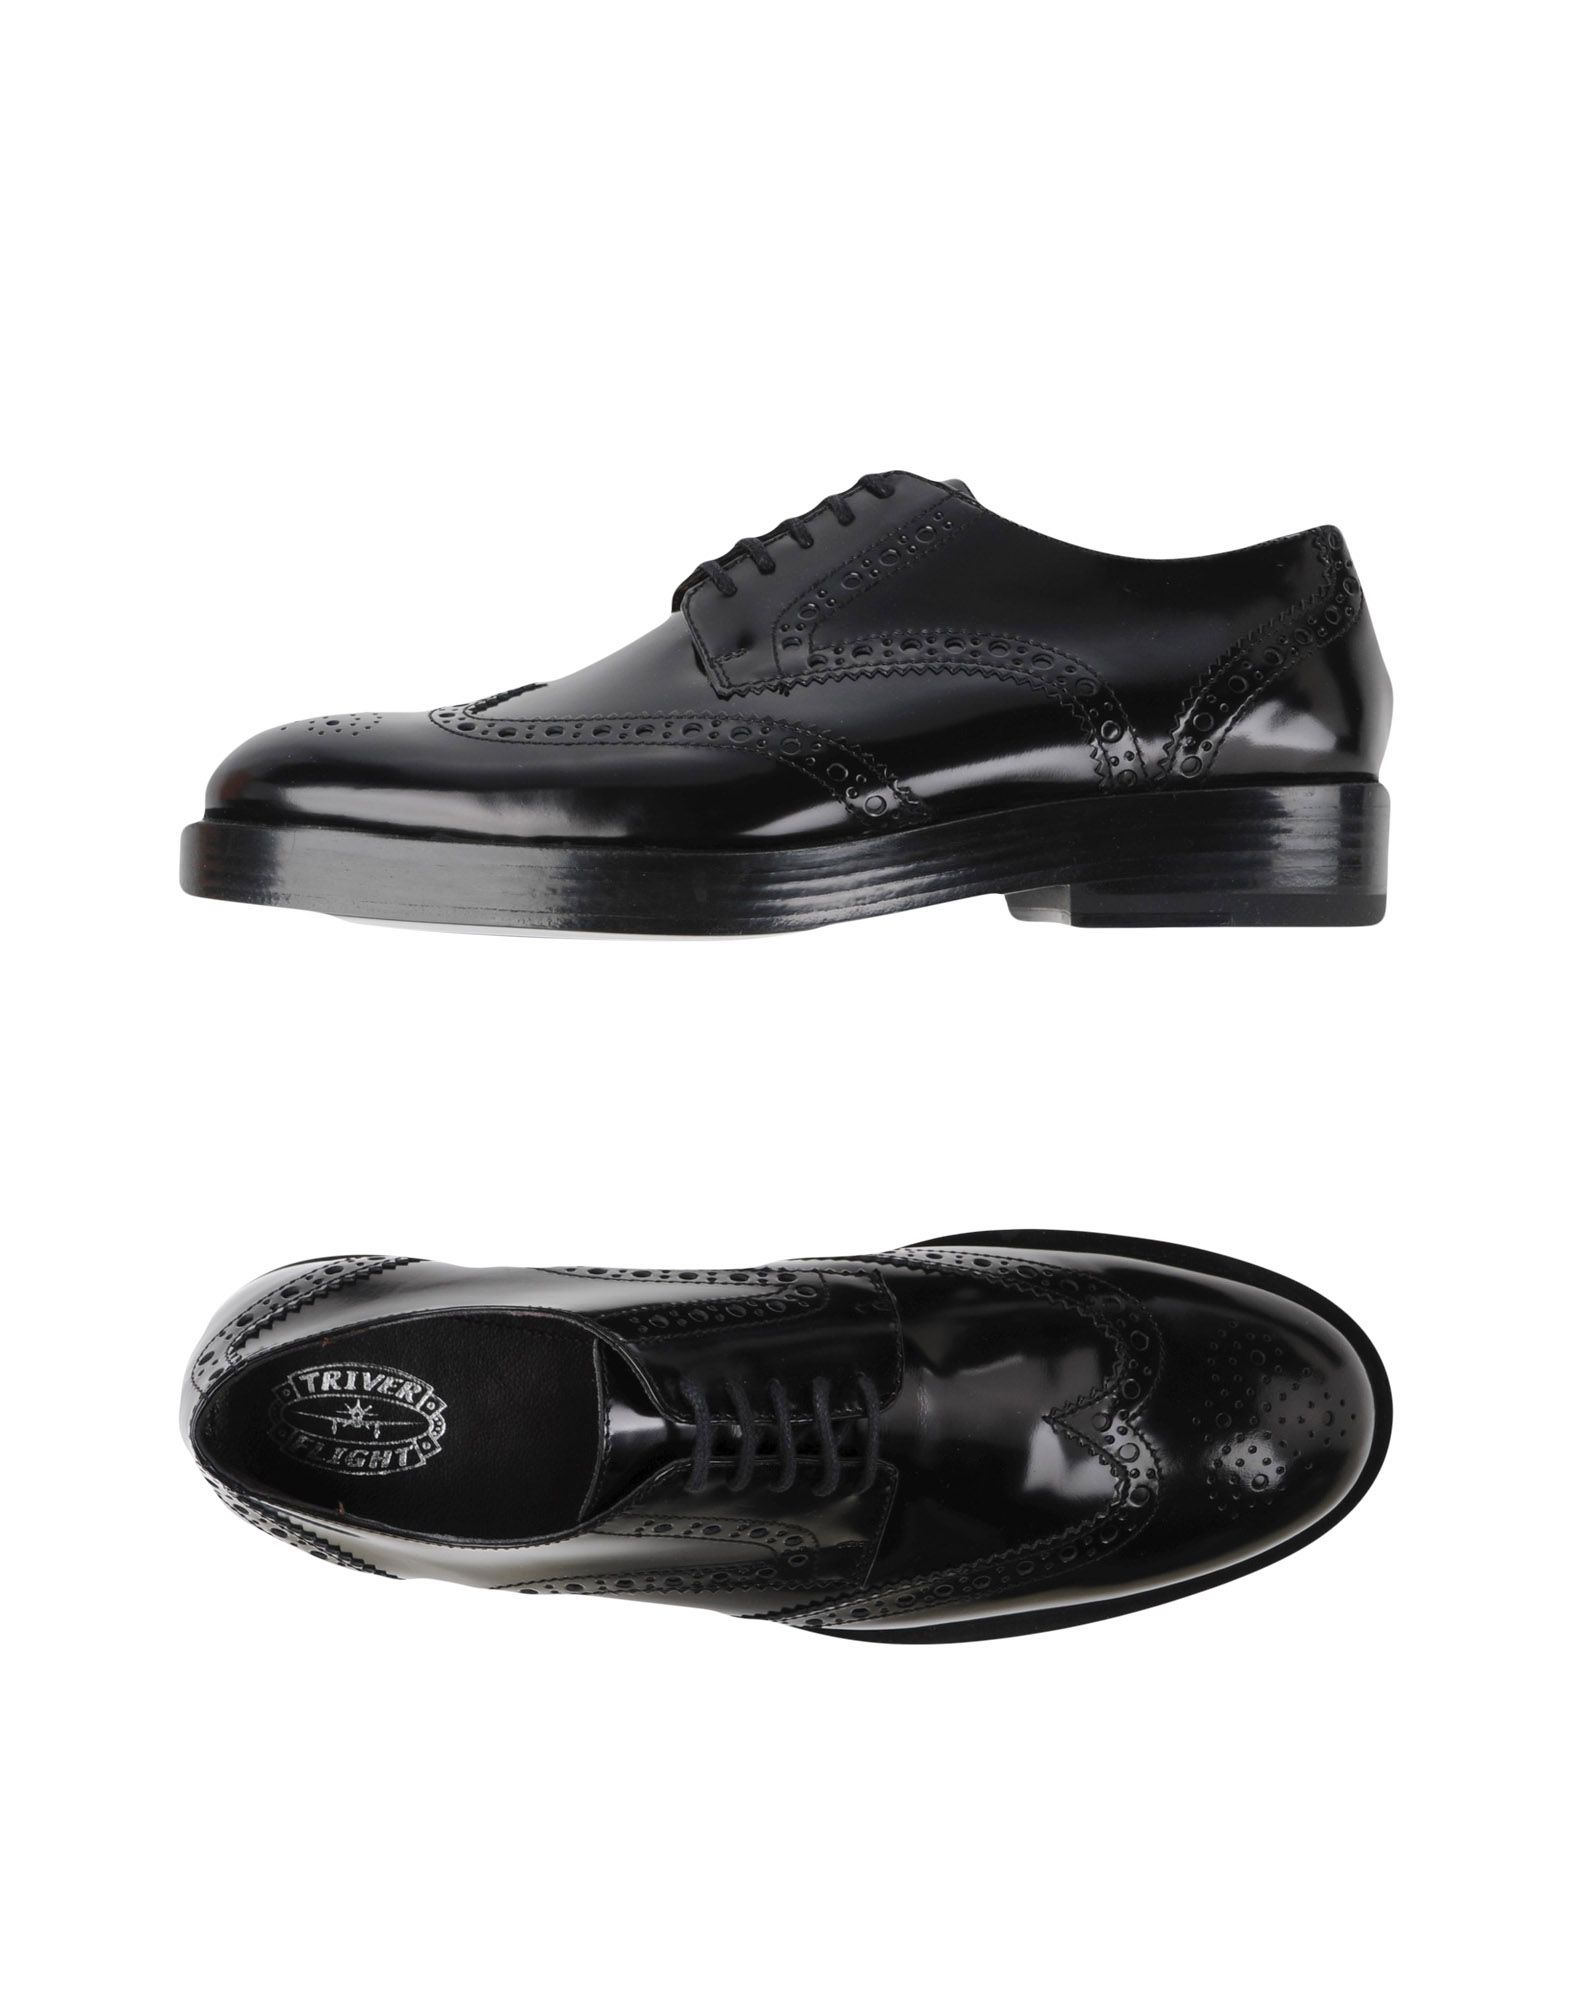 Gut um Schnürschuhe billige Schuhe zu tragenTriver Flight Schnürschuhe um Damen  11305793CJ 7b0505